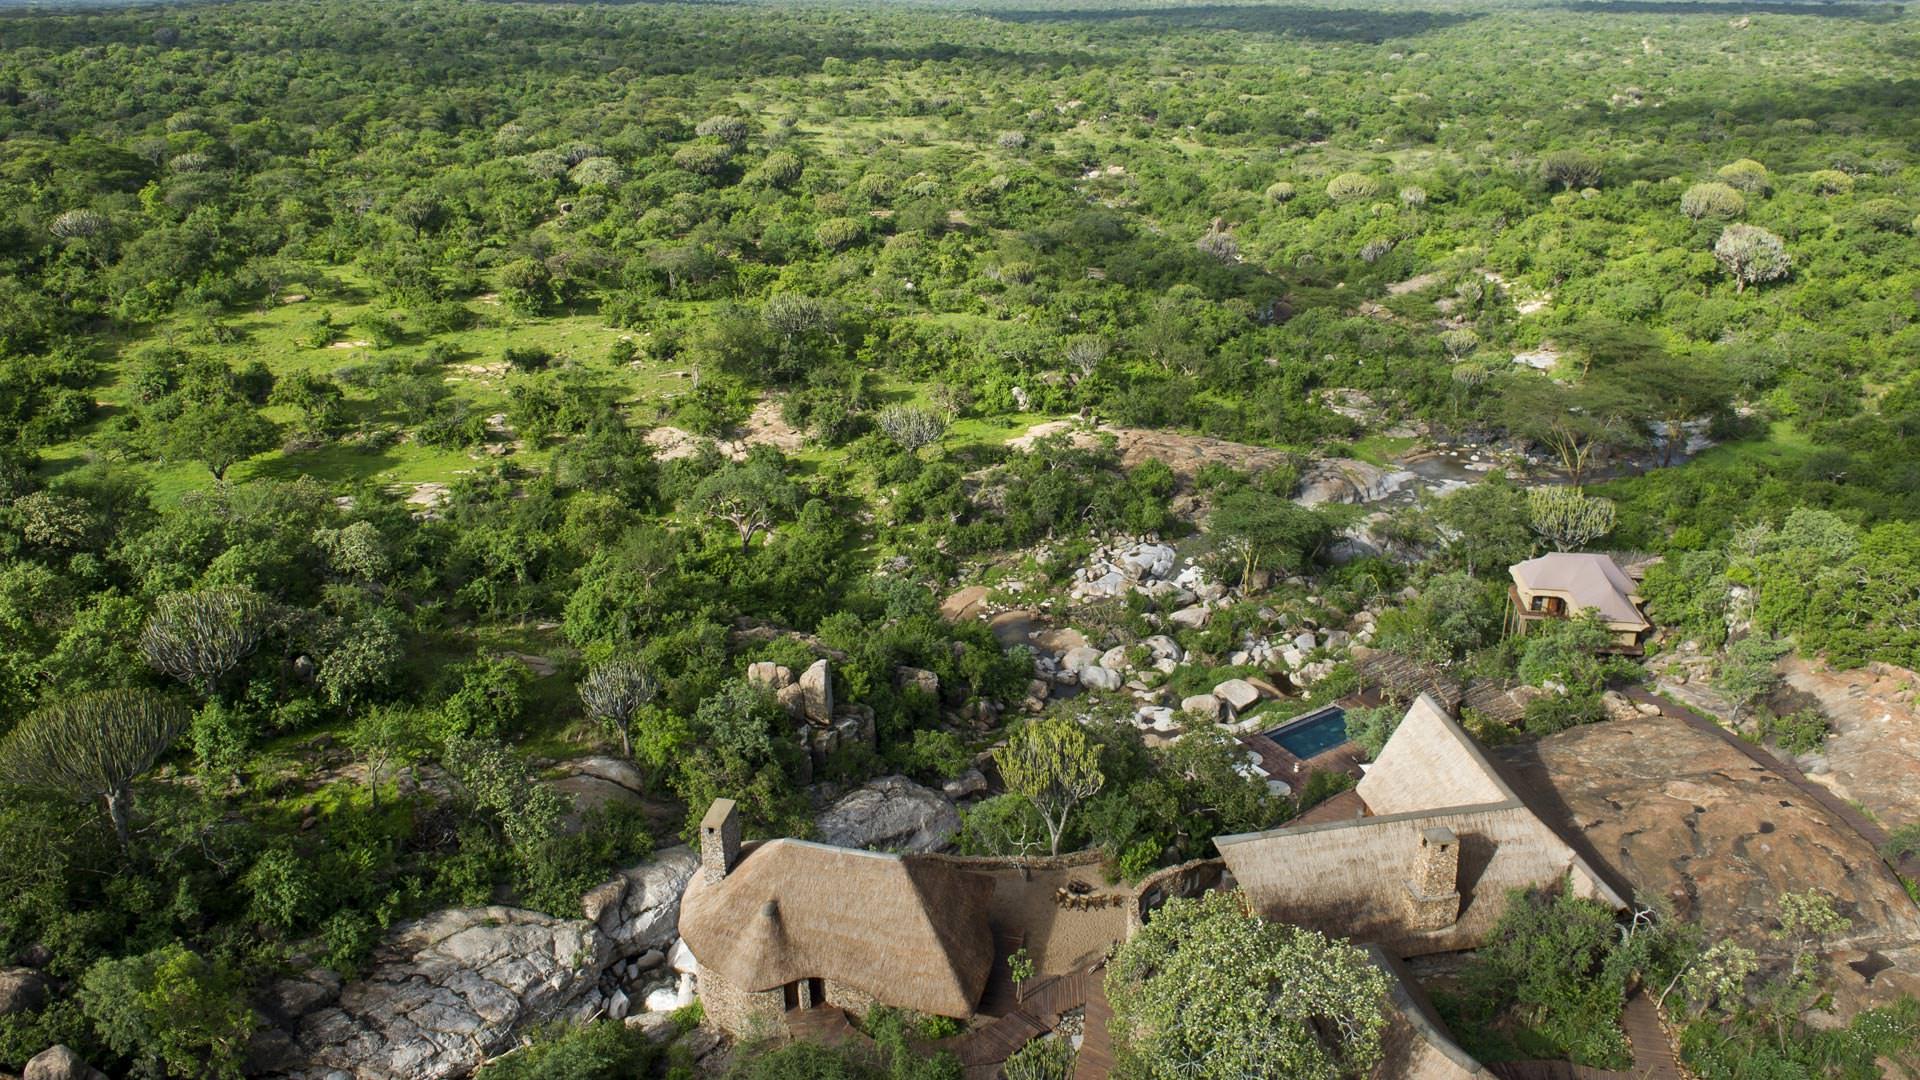 Aerial view of Mwiba Lodge